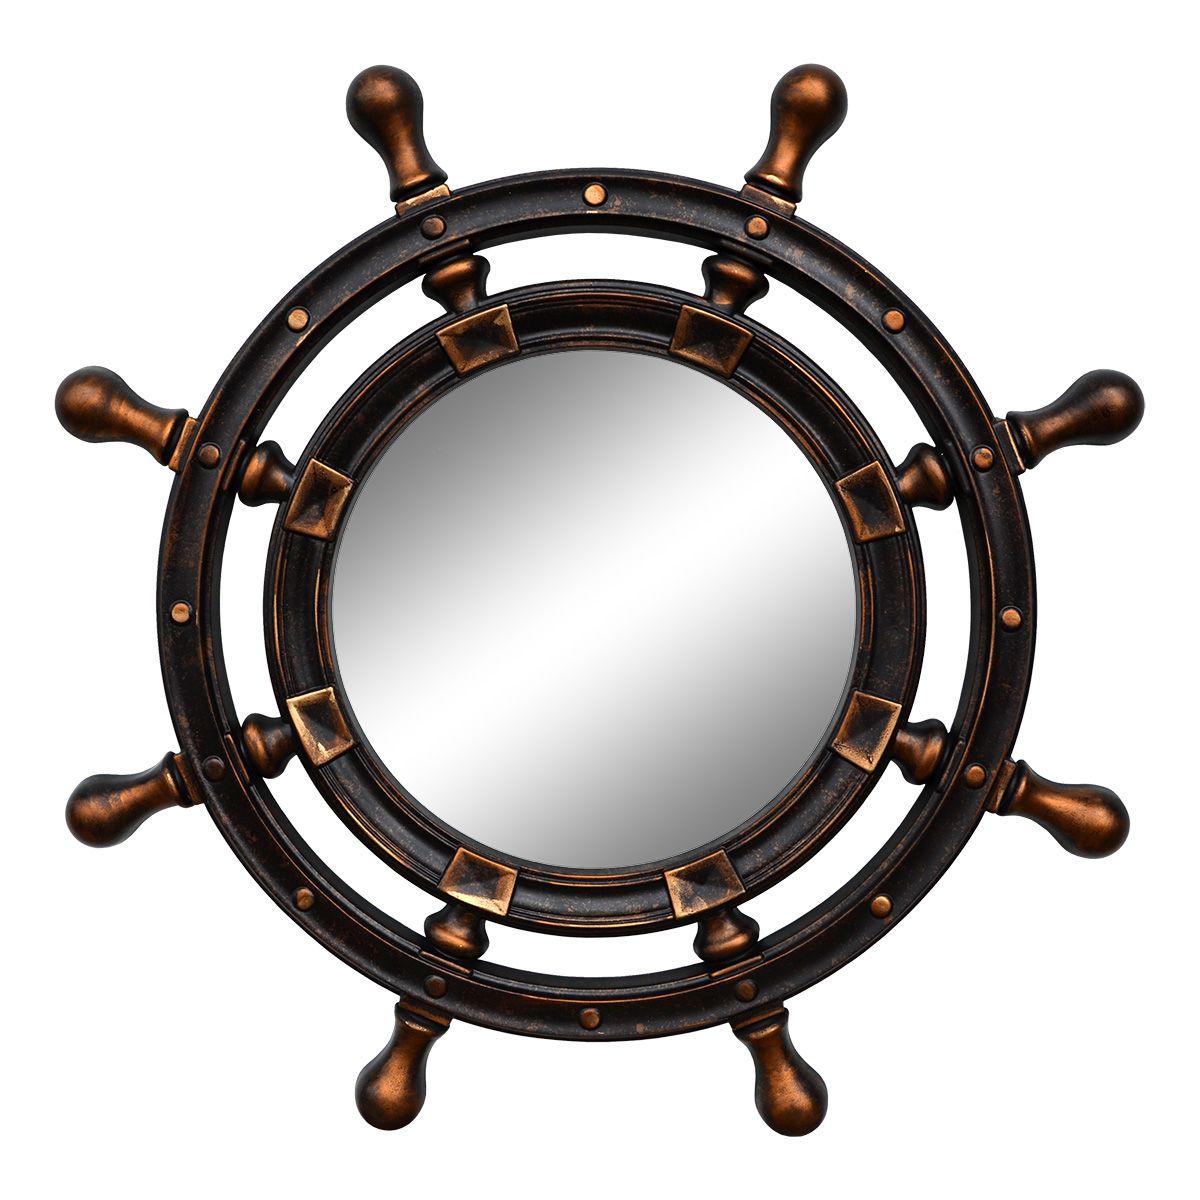 Зеркало VezzoLLi Штурвал, цвет: коричневый, диаметр 90 см3-05